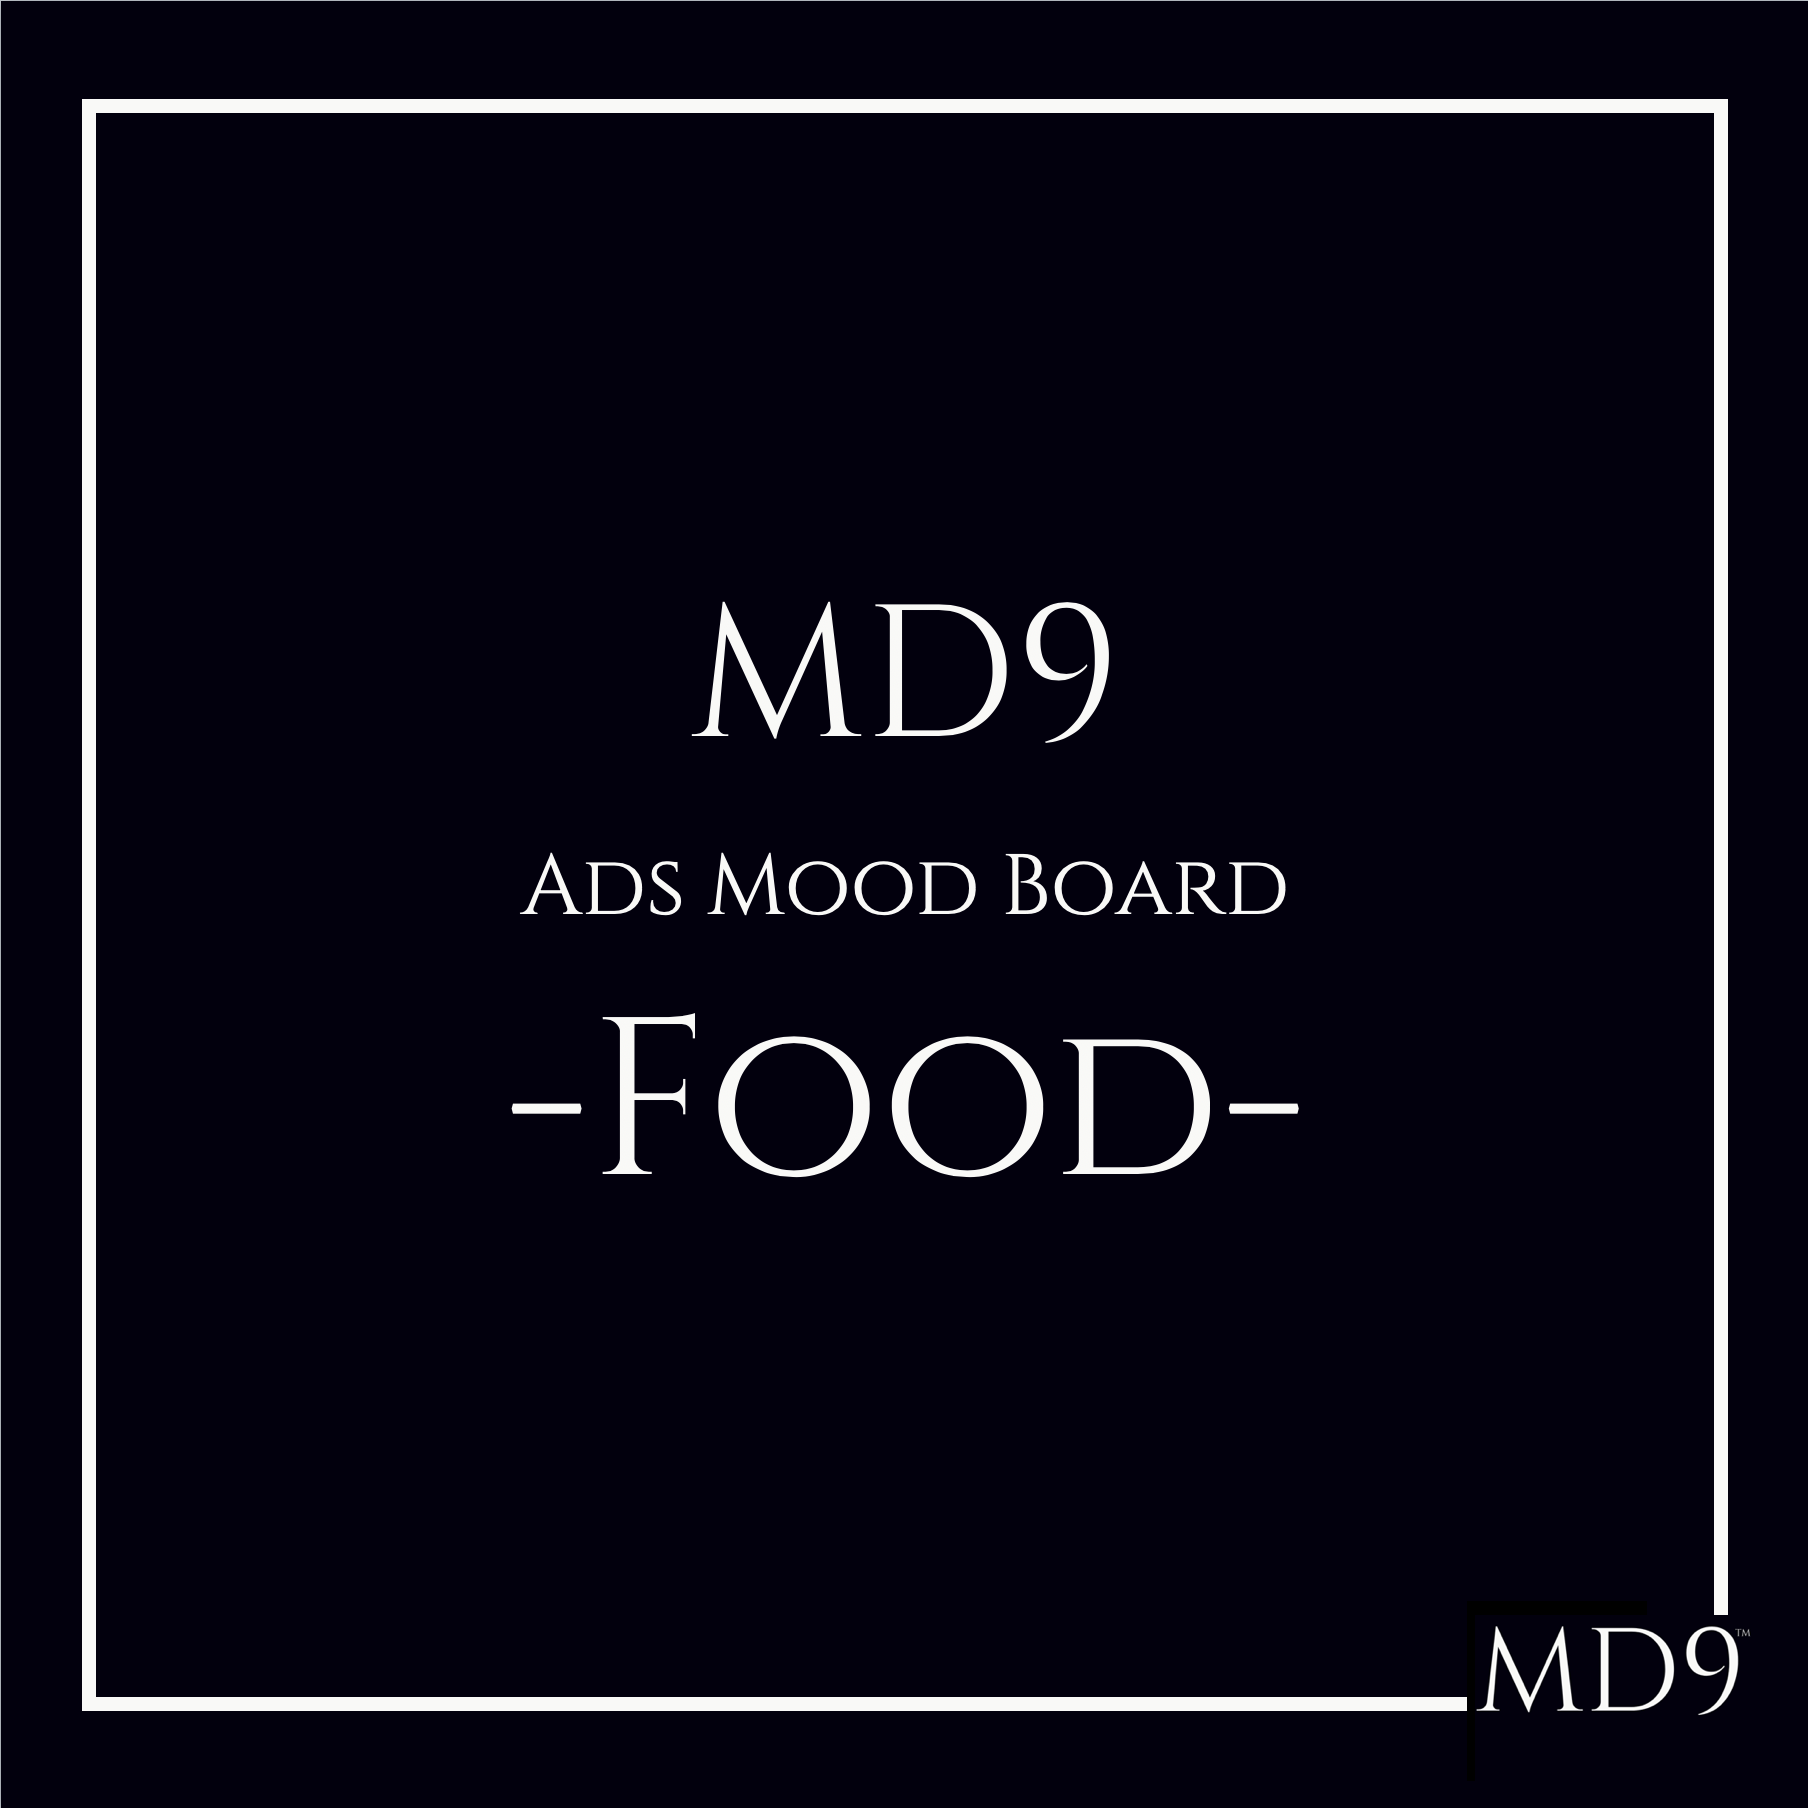 MD9's Ads Mood Board – Food